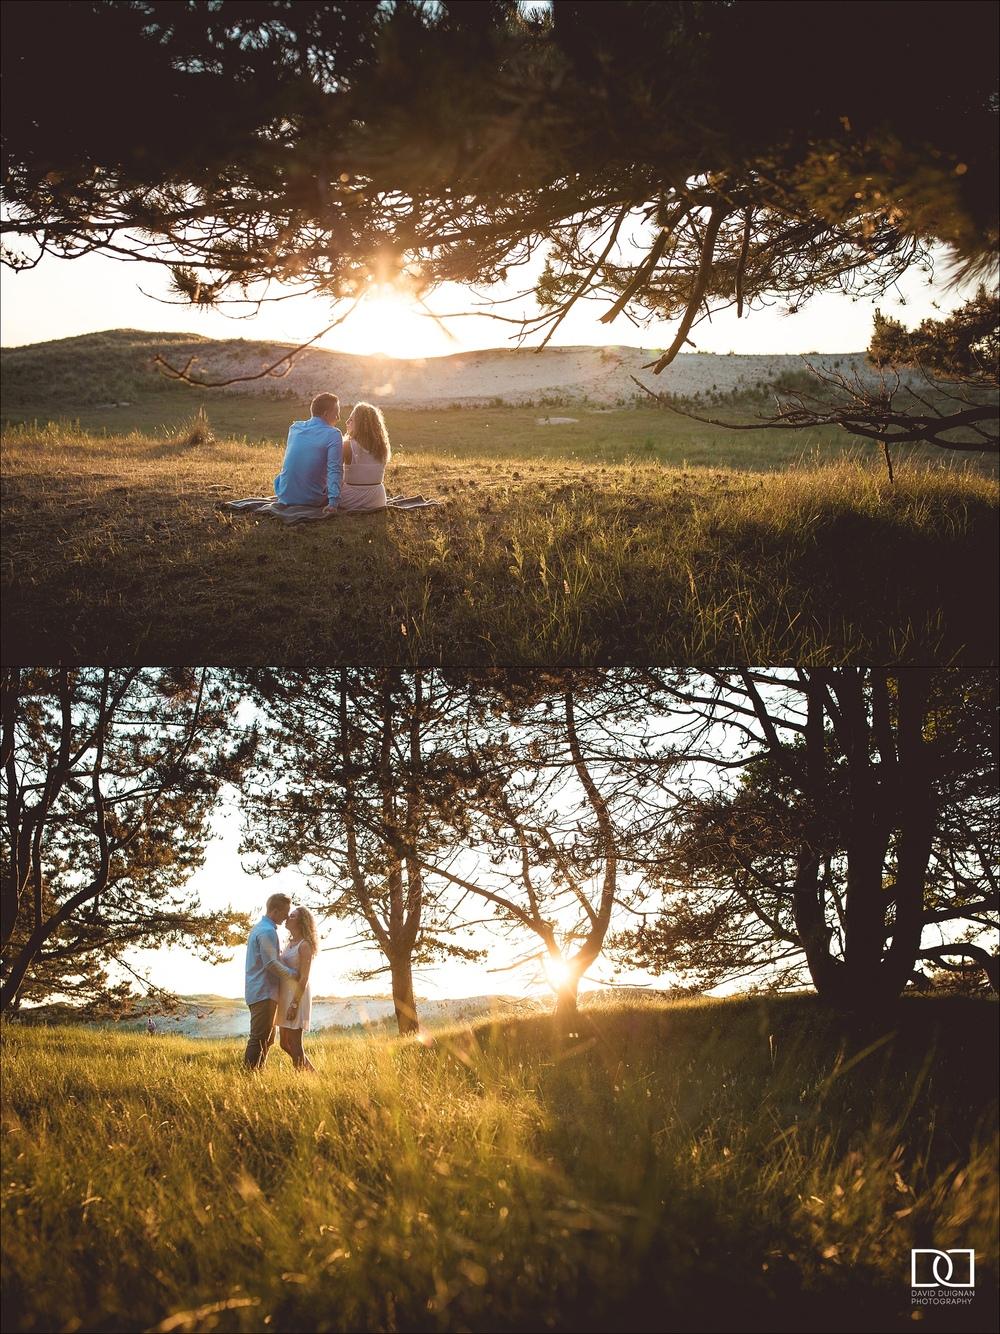 dublin_wedding_photographer_david_duignan_photography_engagement_shoot_Ireland_0014.jpg